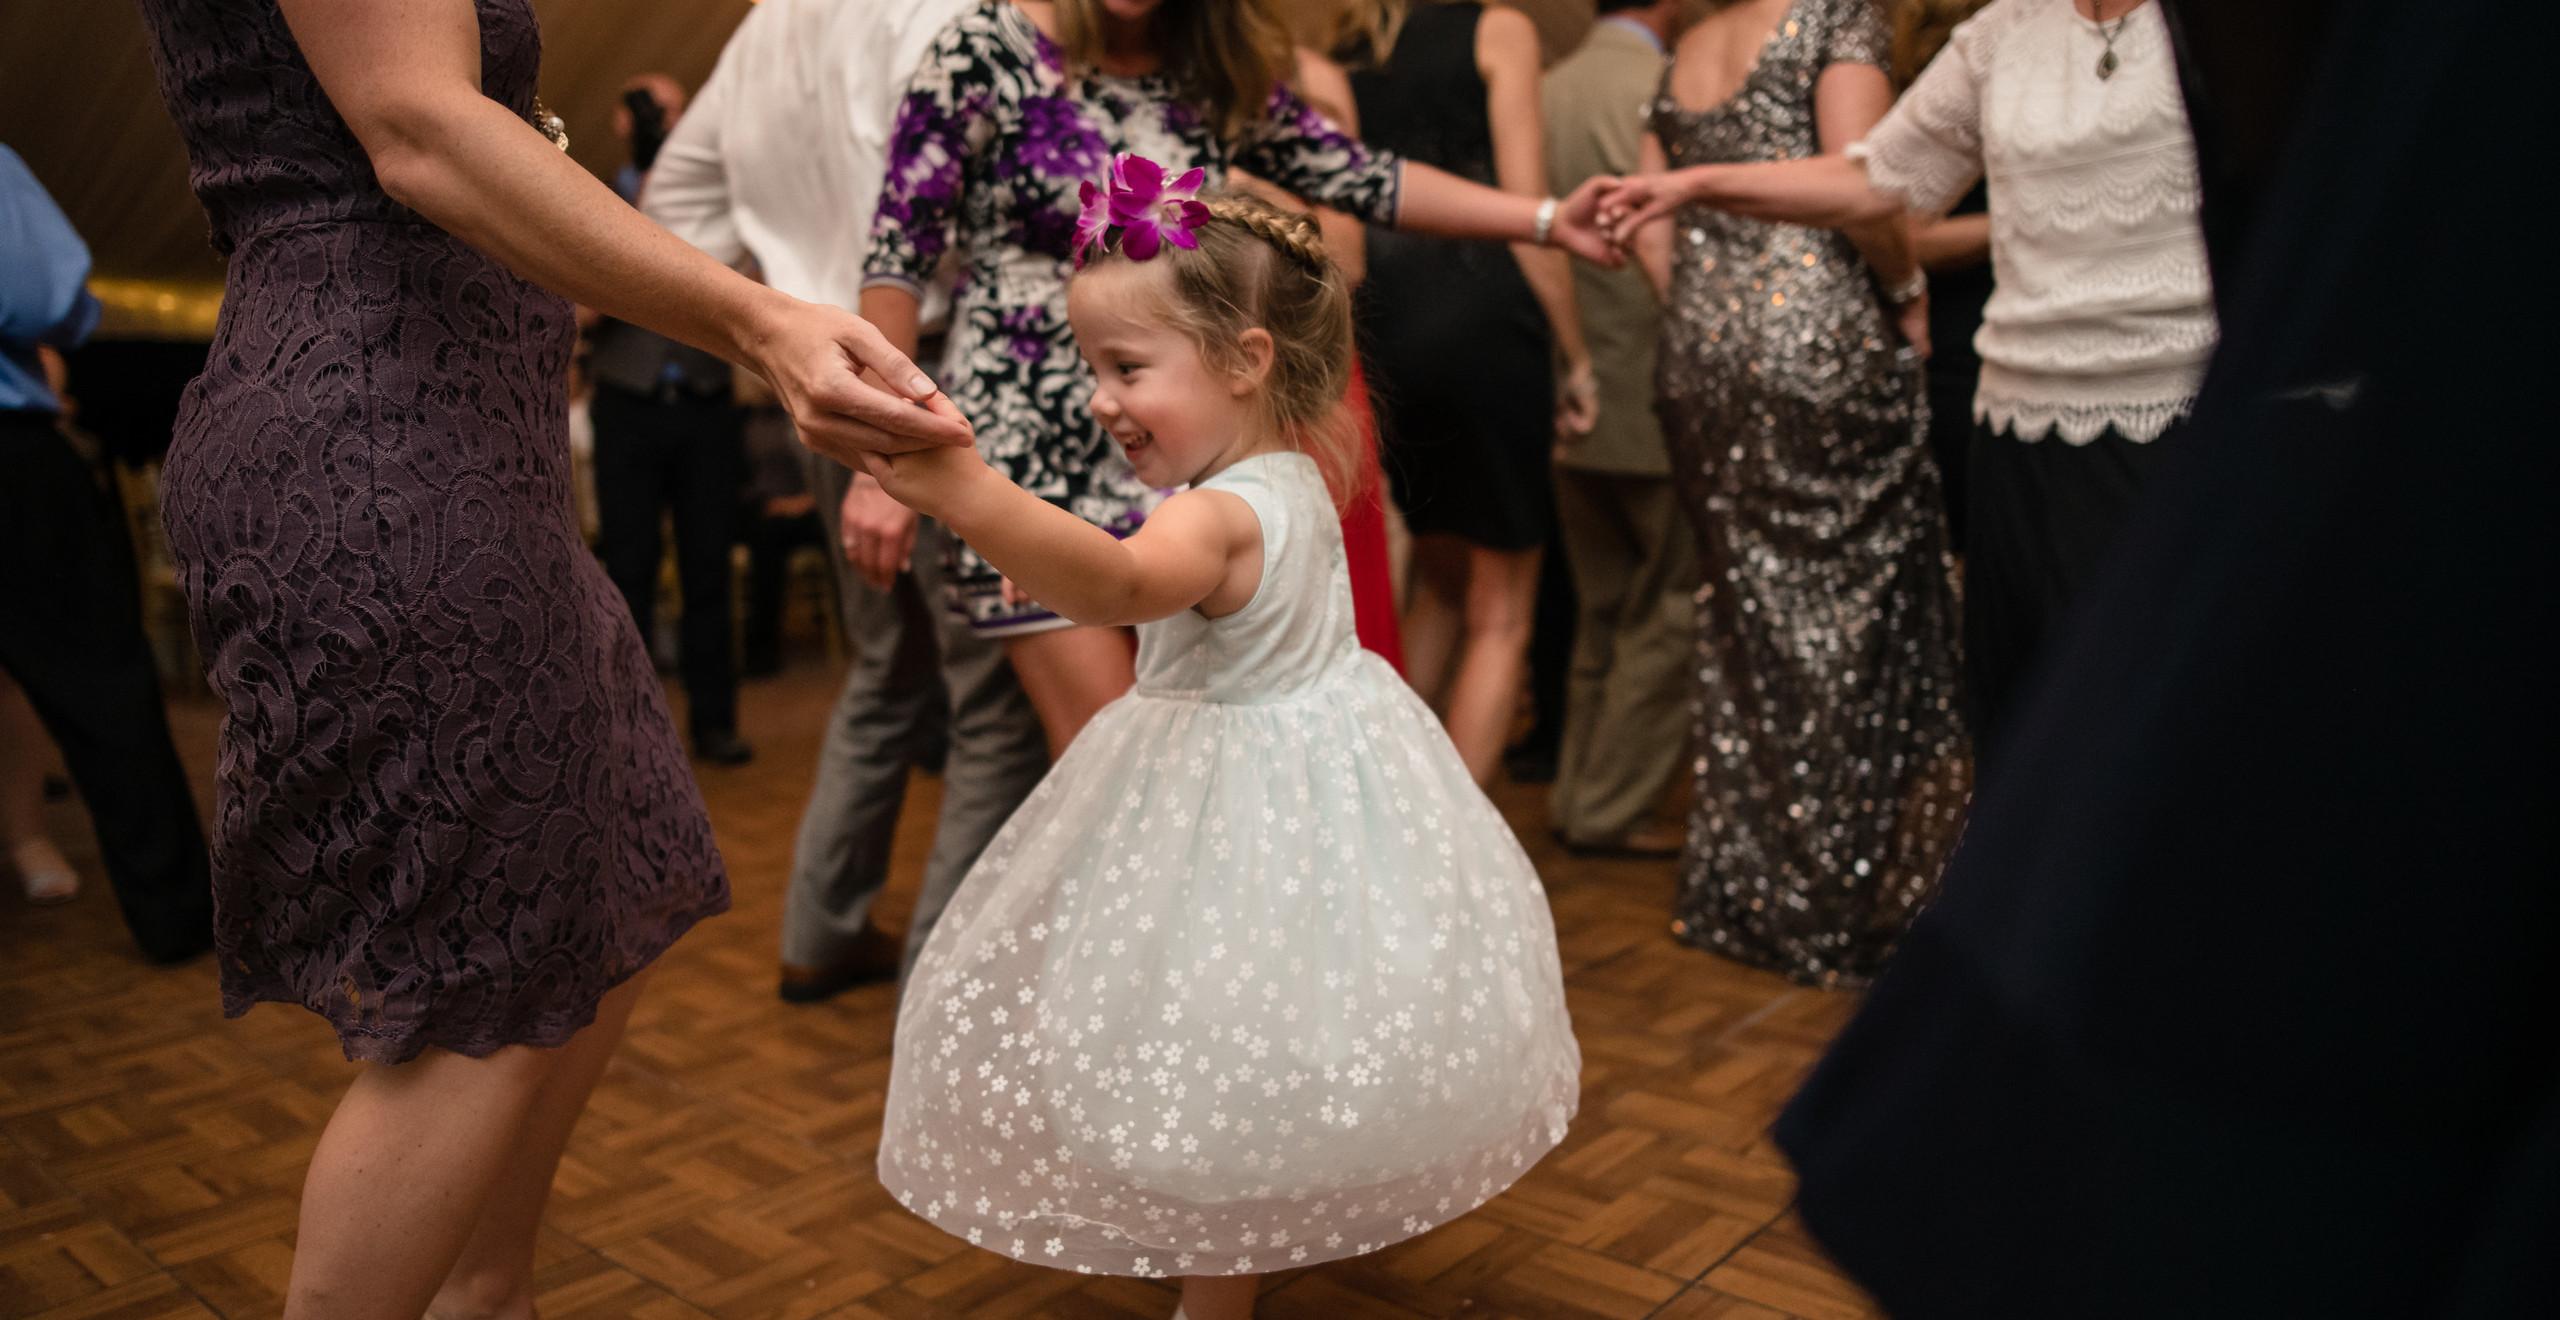 flowergirl dancing at wedding